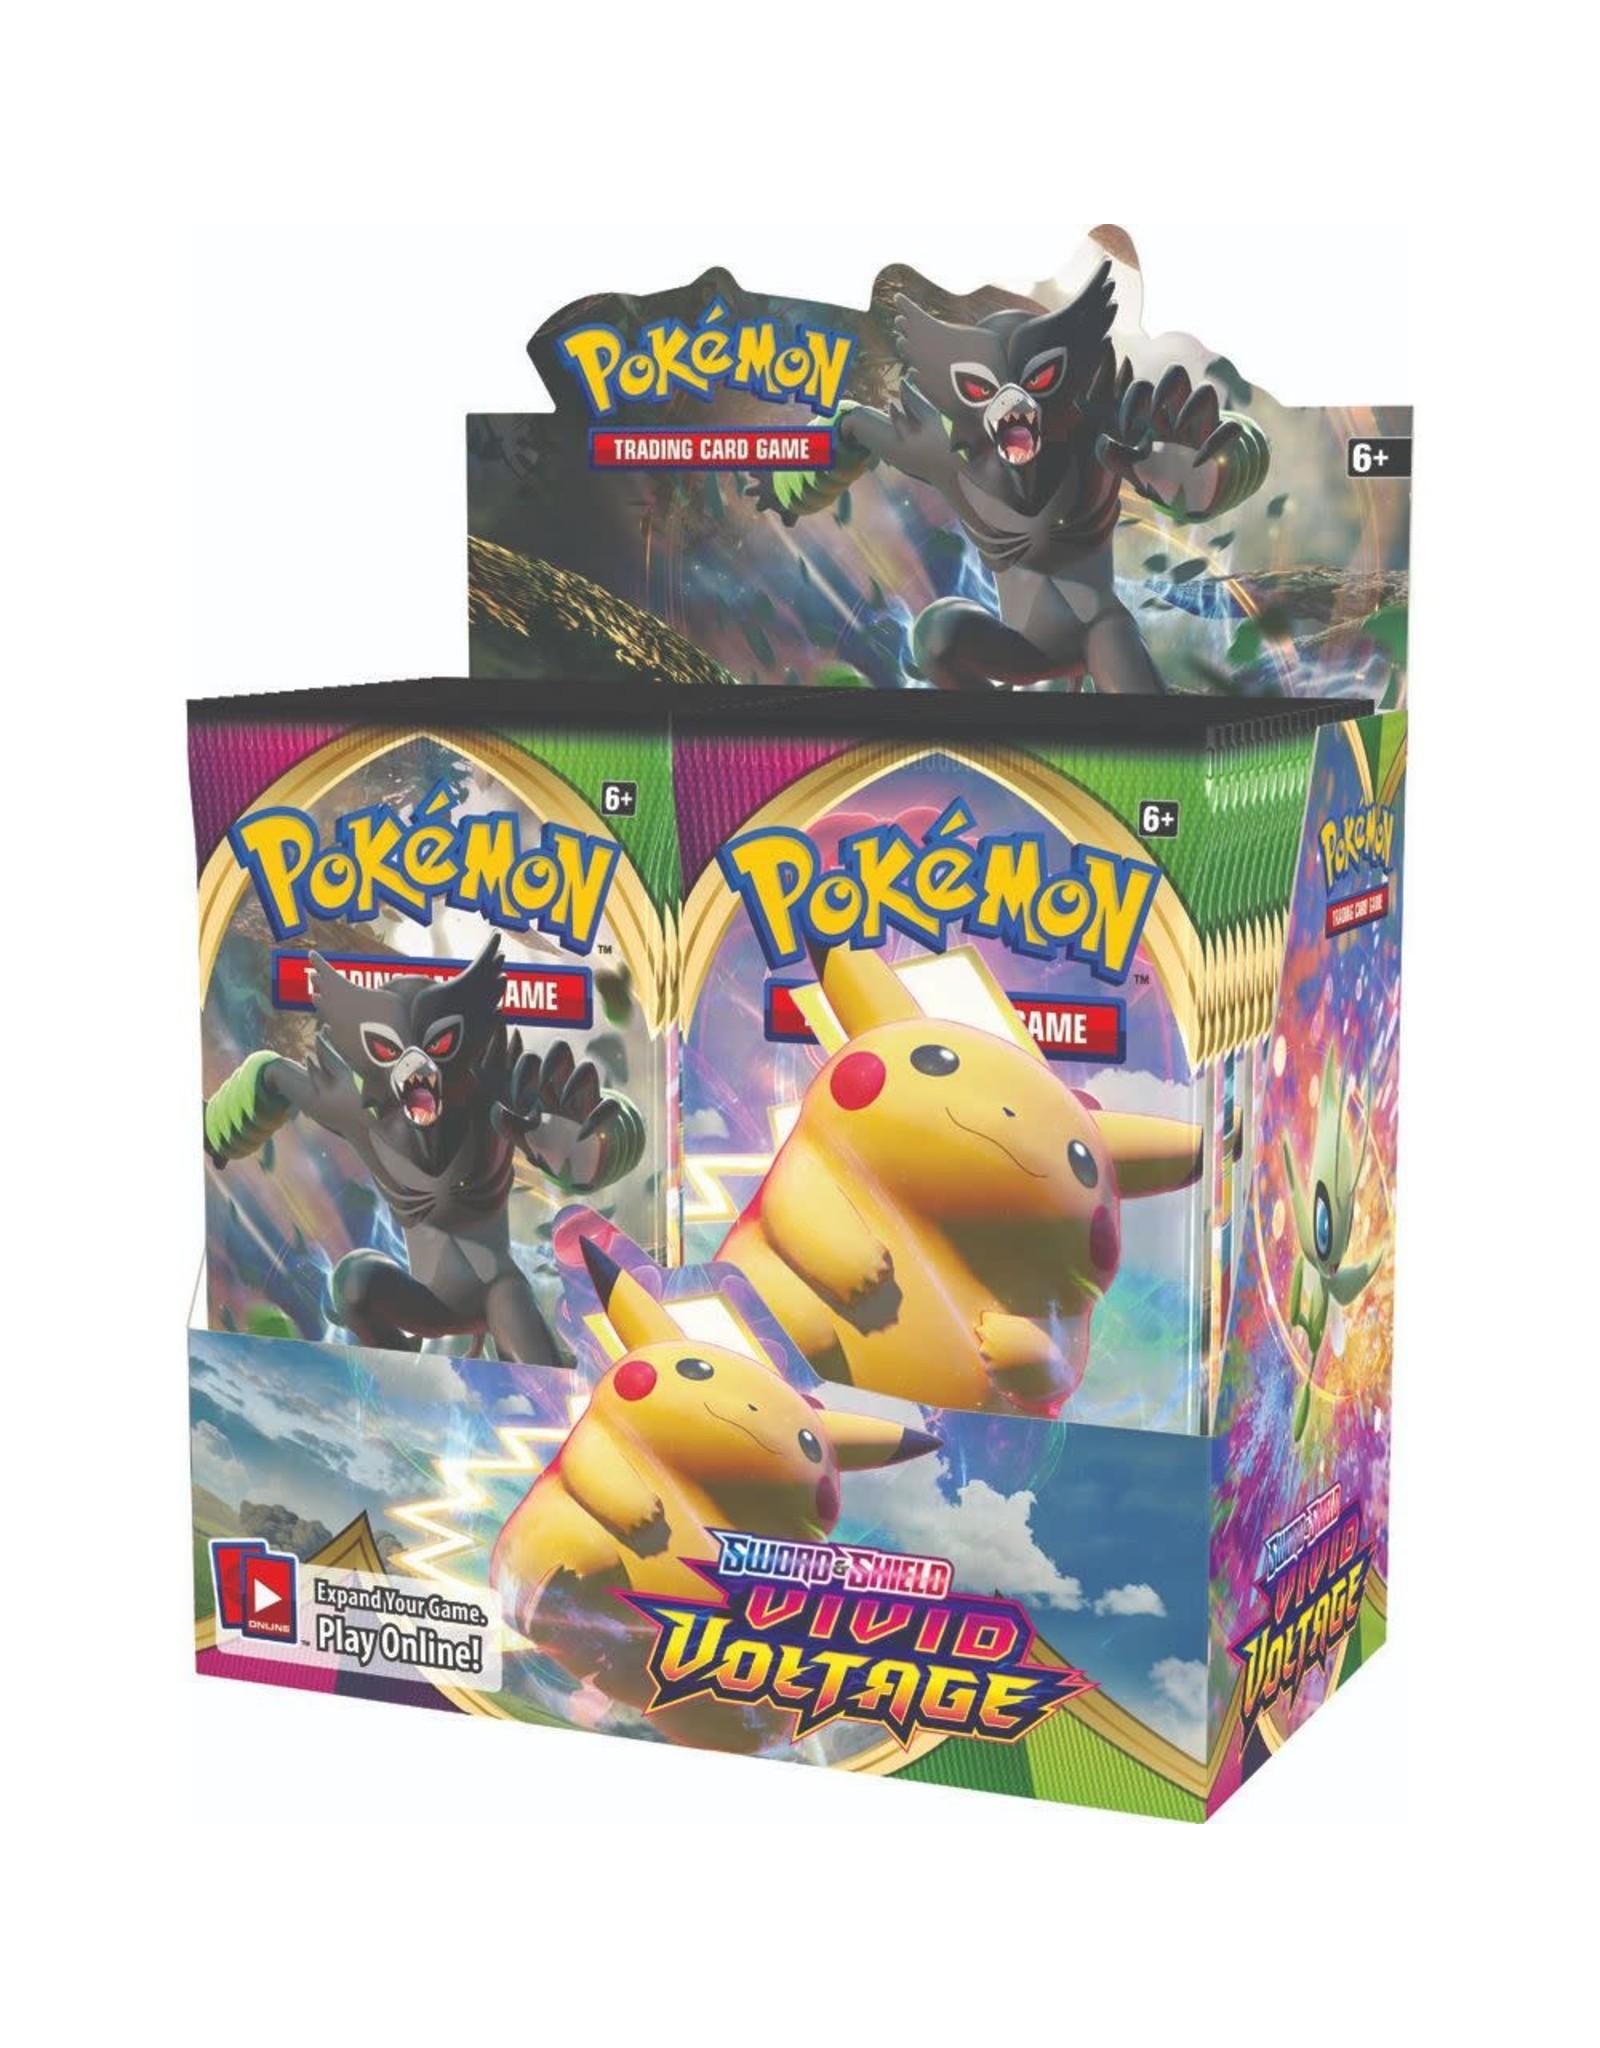 Pokemon Company Pokémon Sword & Shield 4: Vivid Voltage - Booster